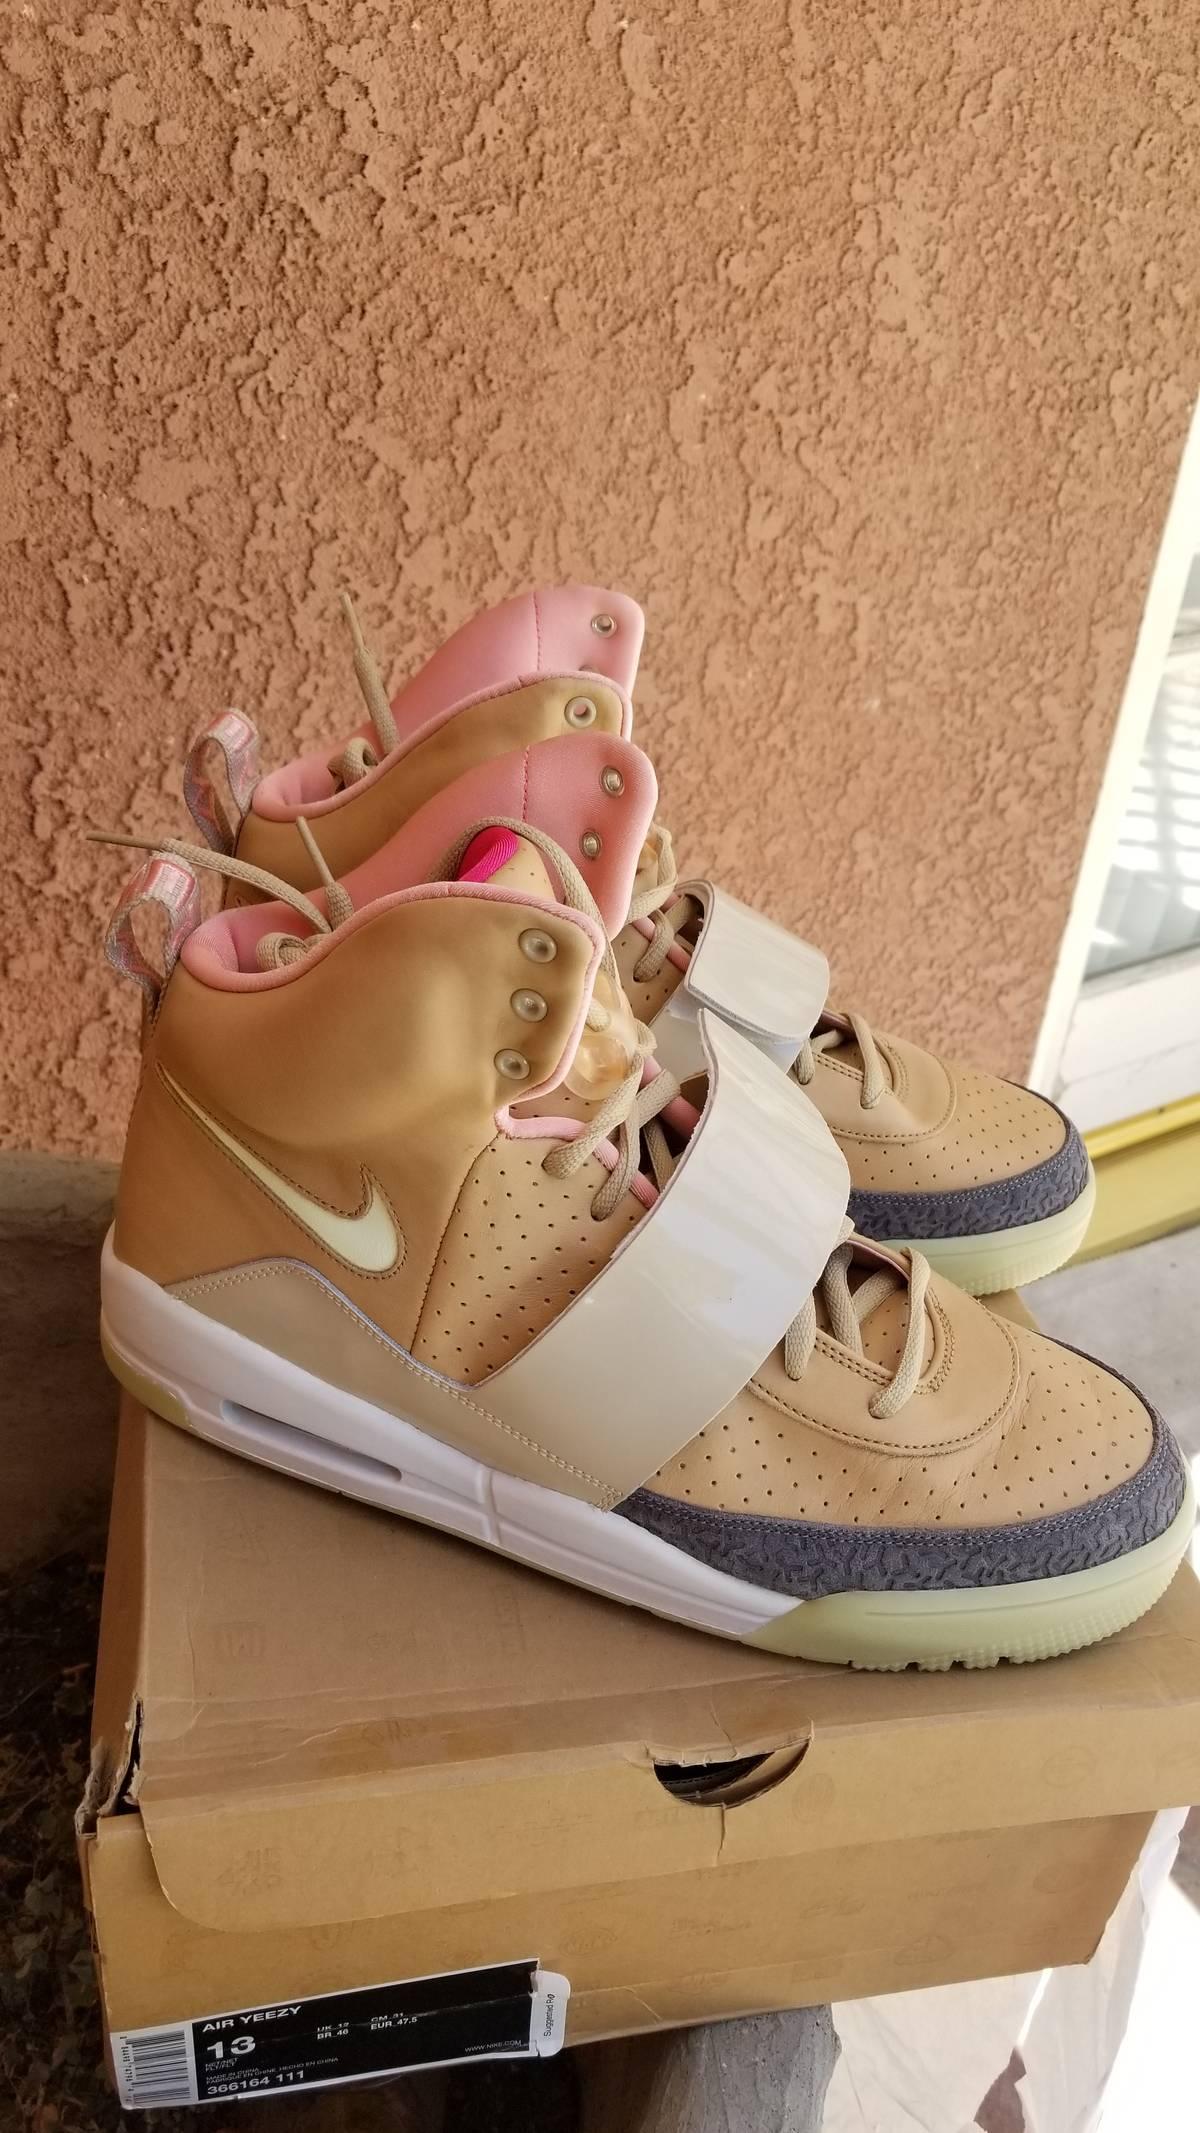 e945f5485e100 Nike Air Yeezy 1 Net   Net Size 13 - Hi-Top Sneakers for Sale - Grailed